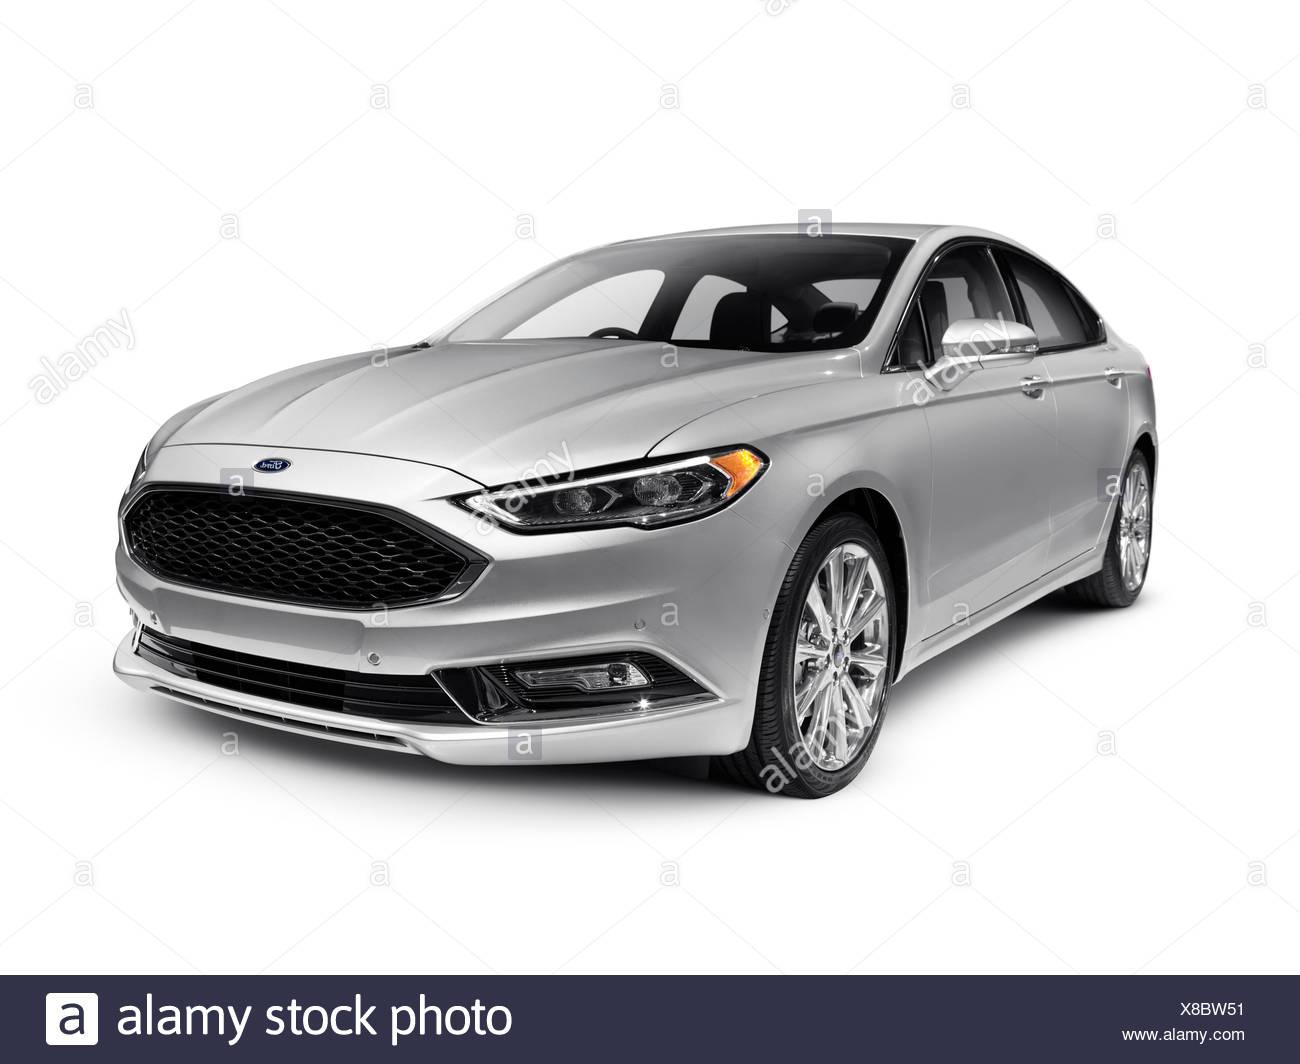 Ford Fusion mid-size silver sedan, car, 2017 - Stock Image